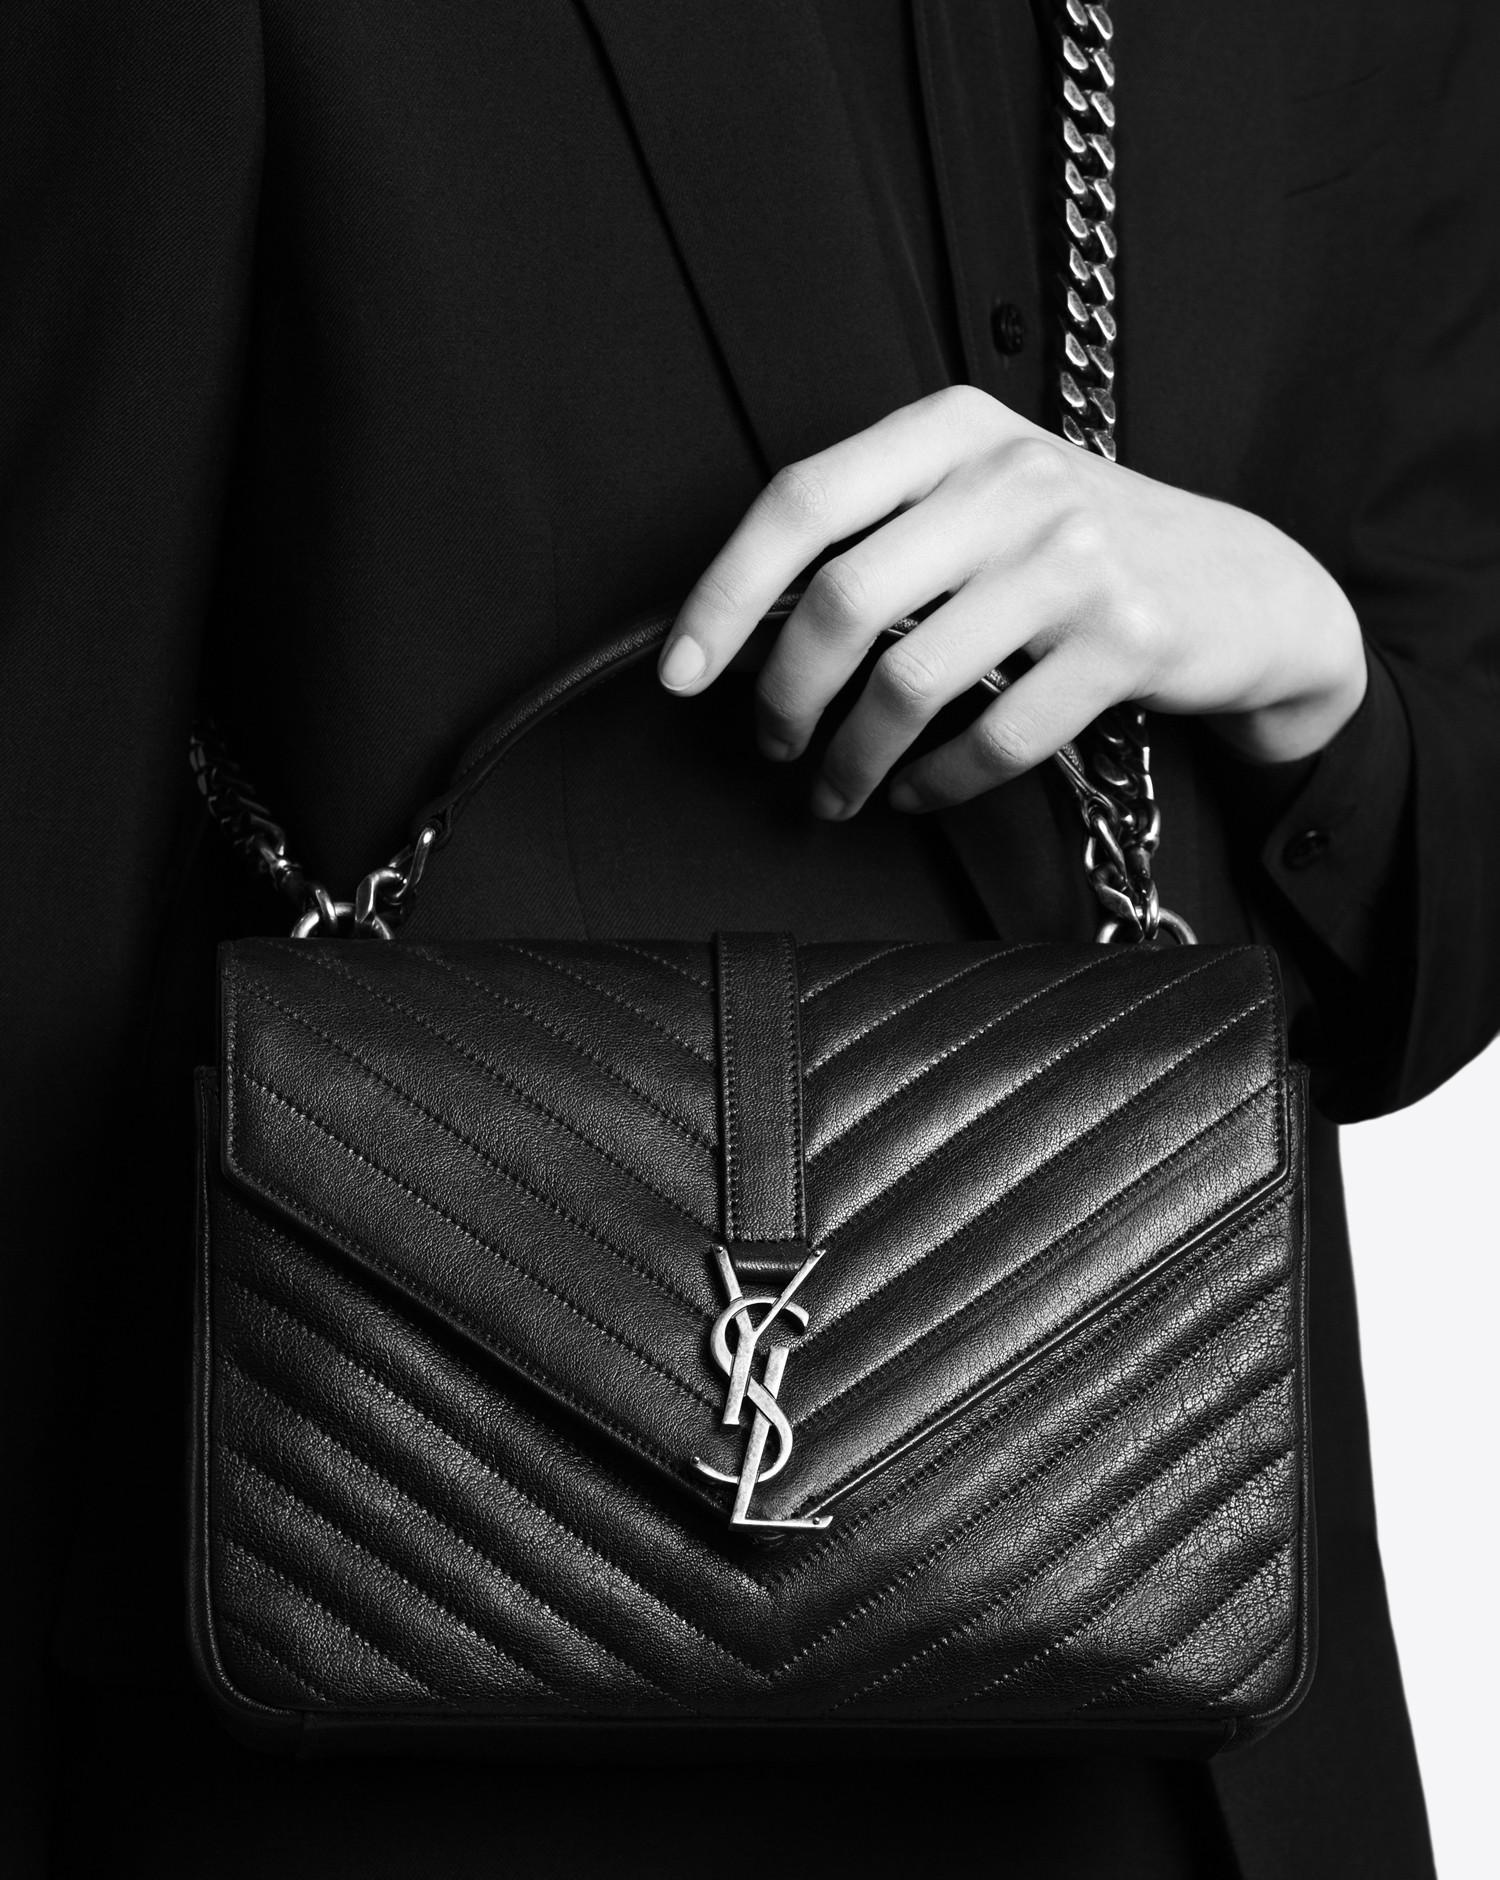 29df3d49f68b Saint Laurent - Black Monogram College Medium Quilted Leather Shoulder Bag  - Lyst. View fullscreen